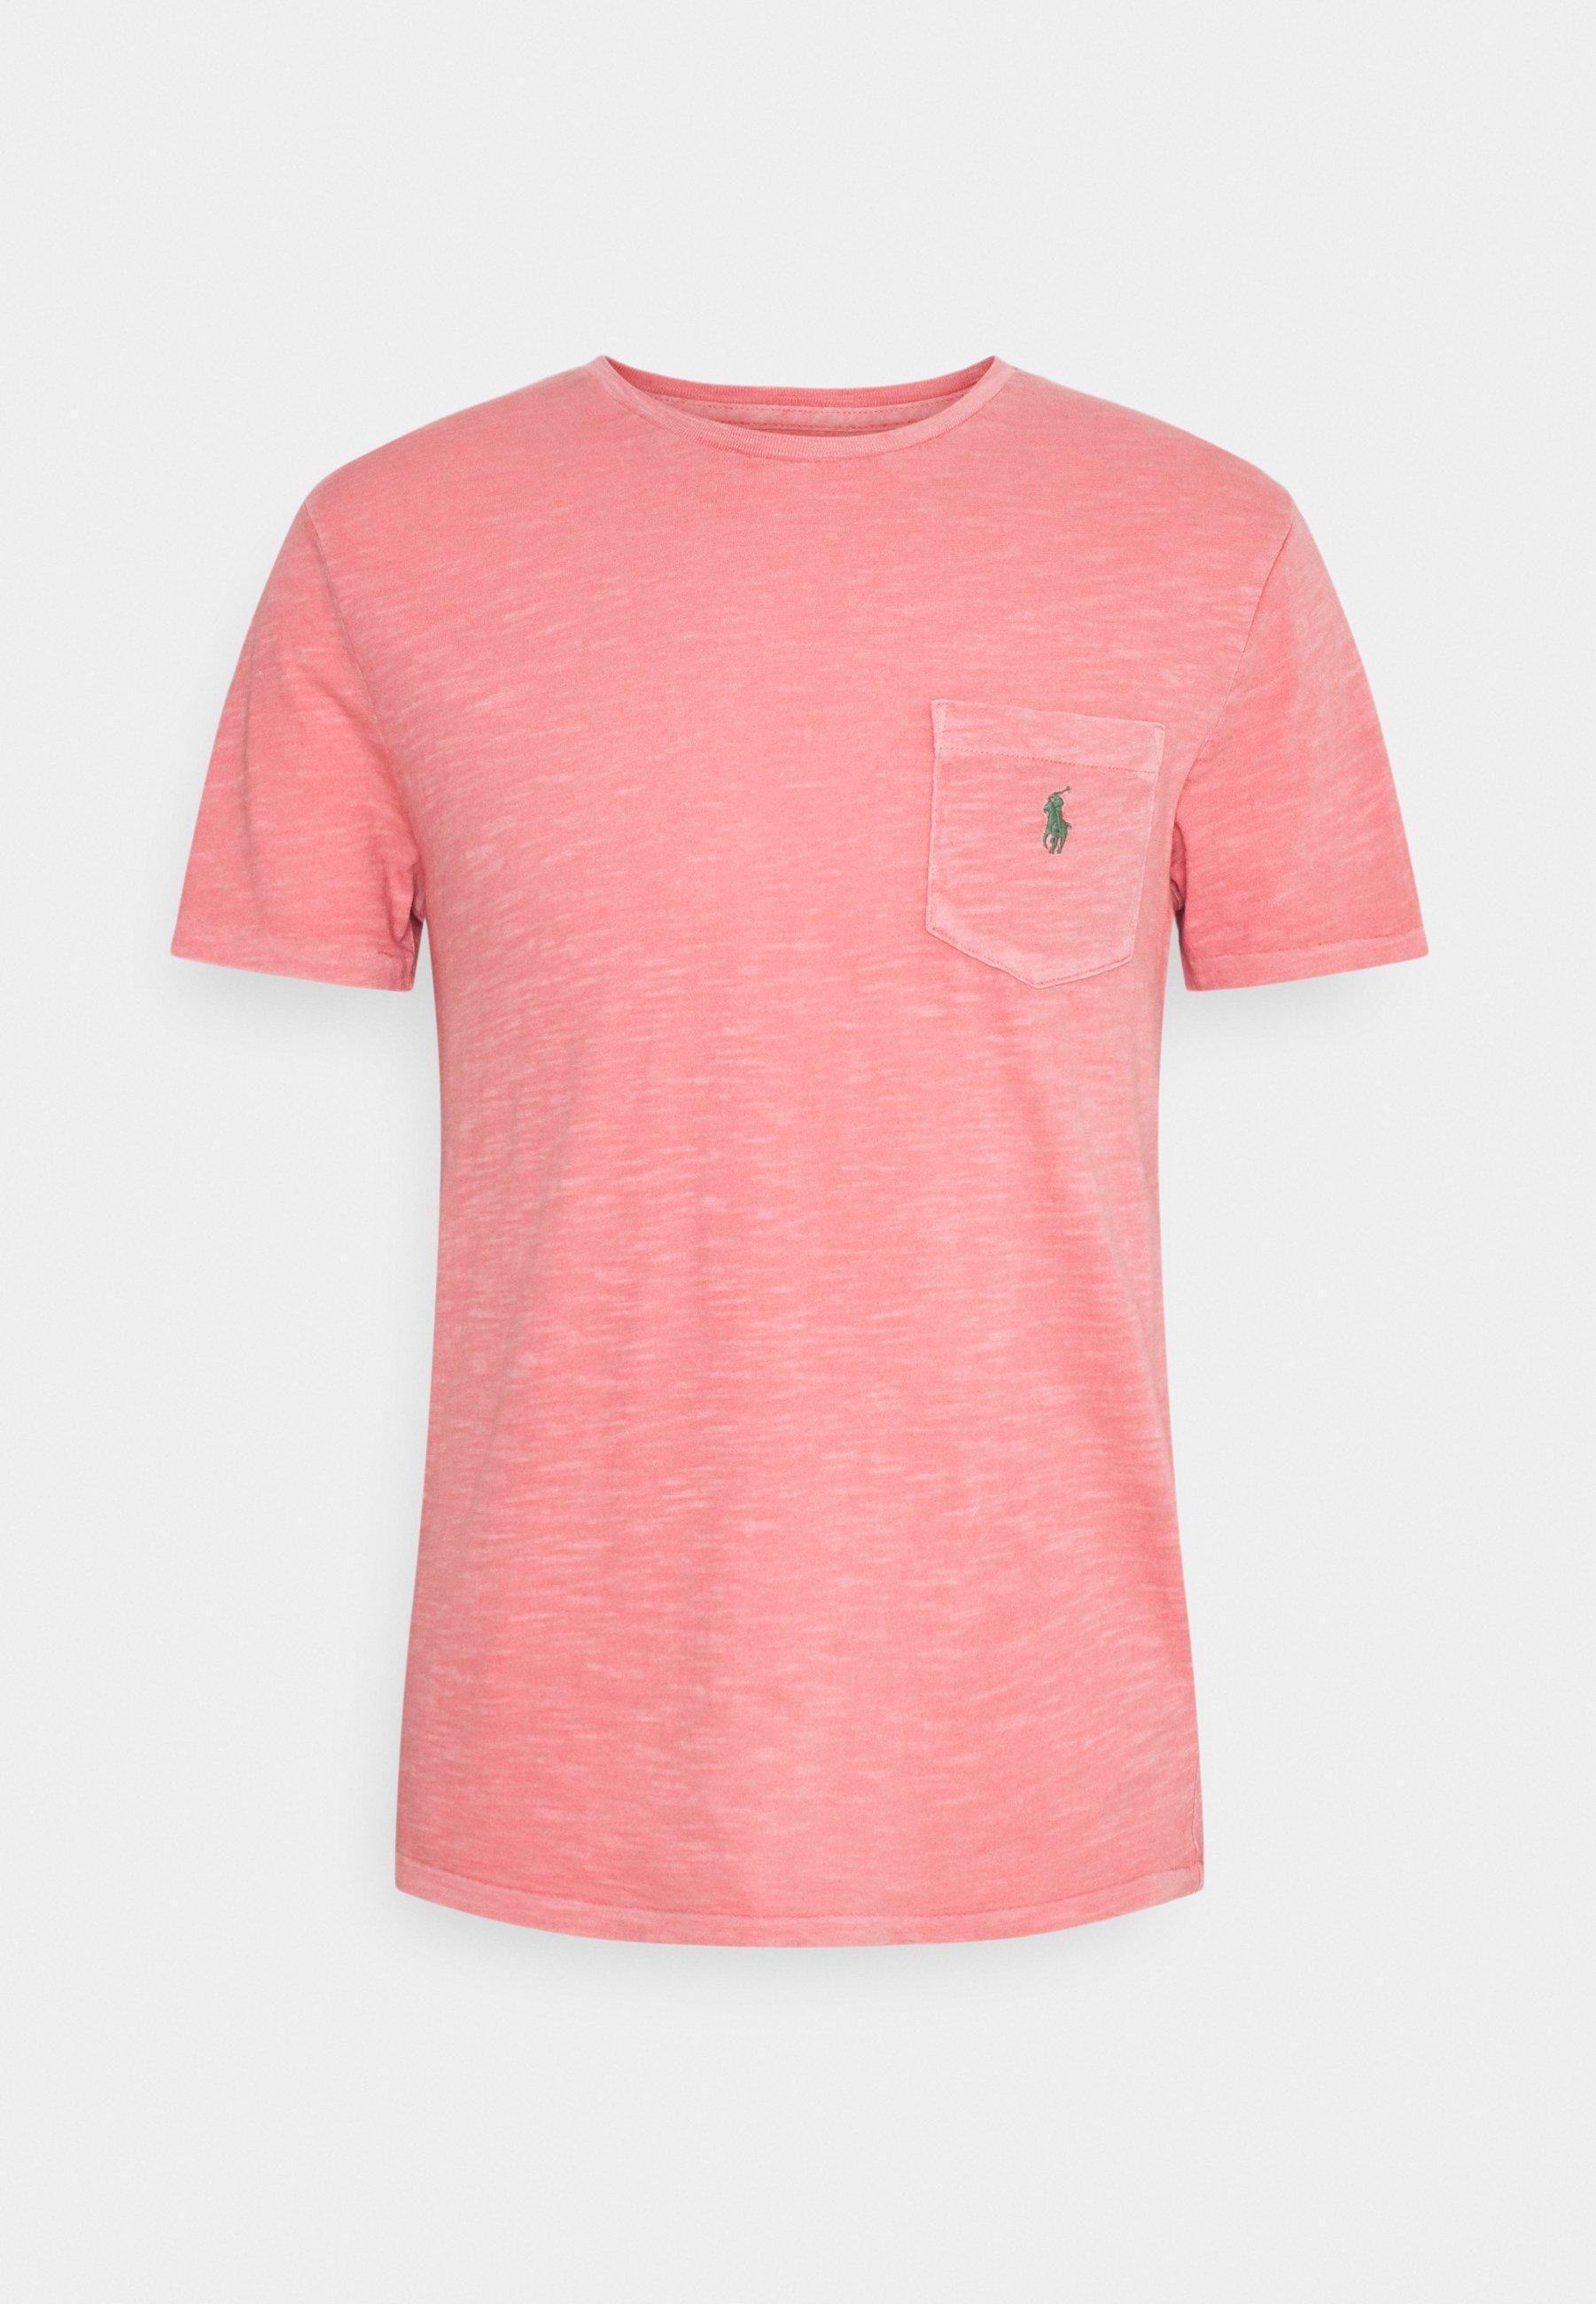 Homme CUSTOM SLIM FIT POCKET T-SHIRT - T-shirt basique